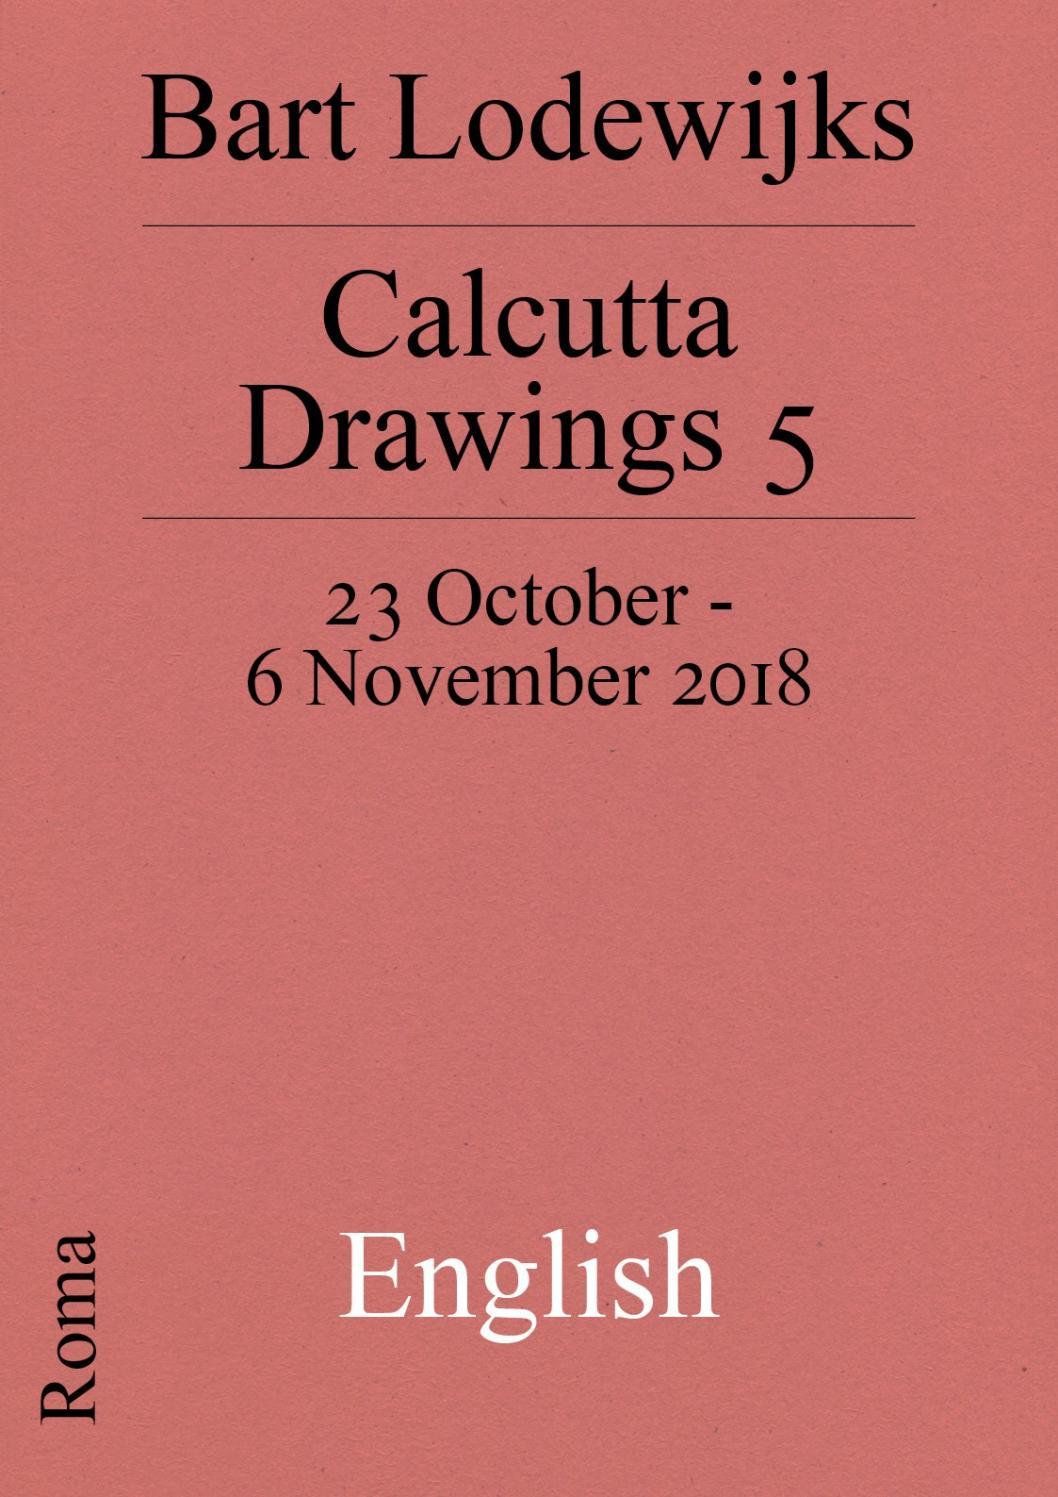 Calcutta Drawings 5 English by Roma Publications - issuu